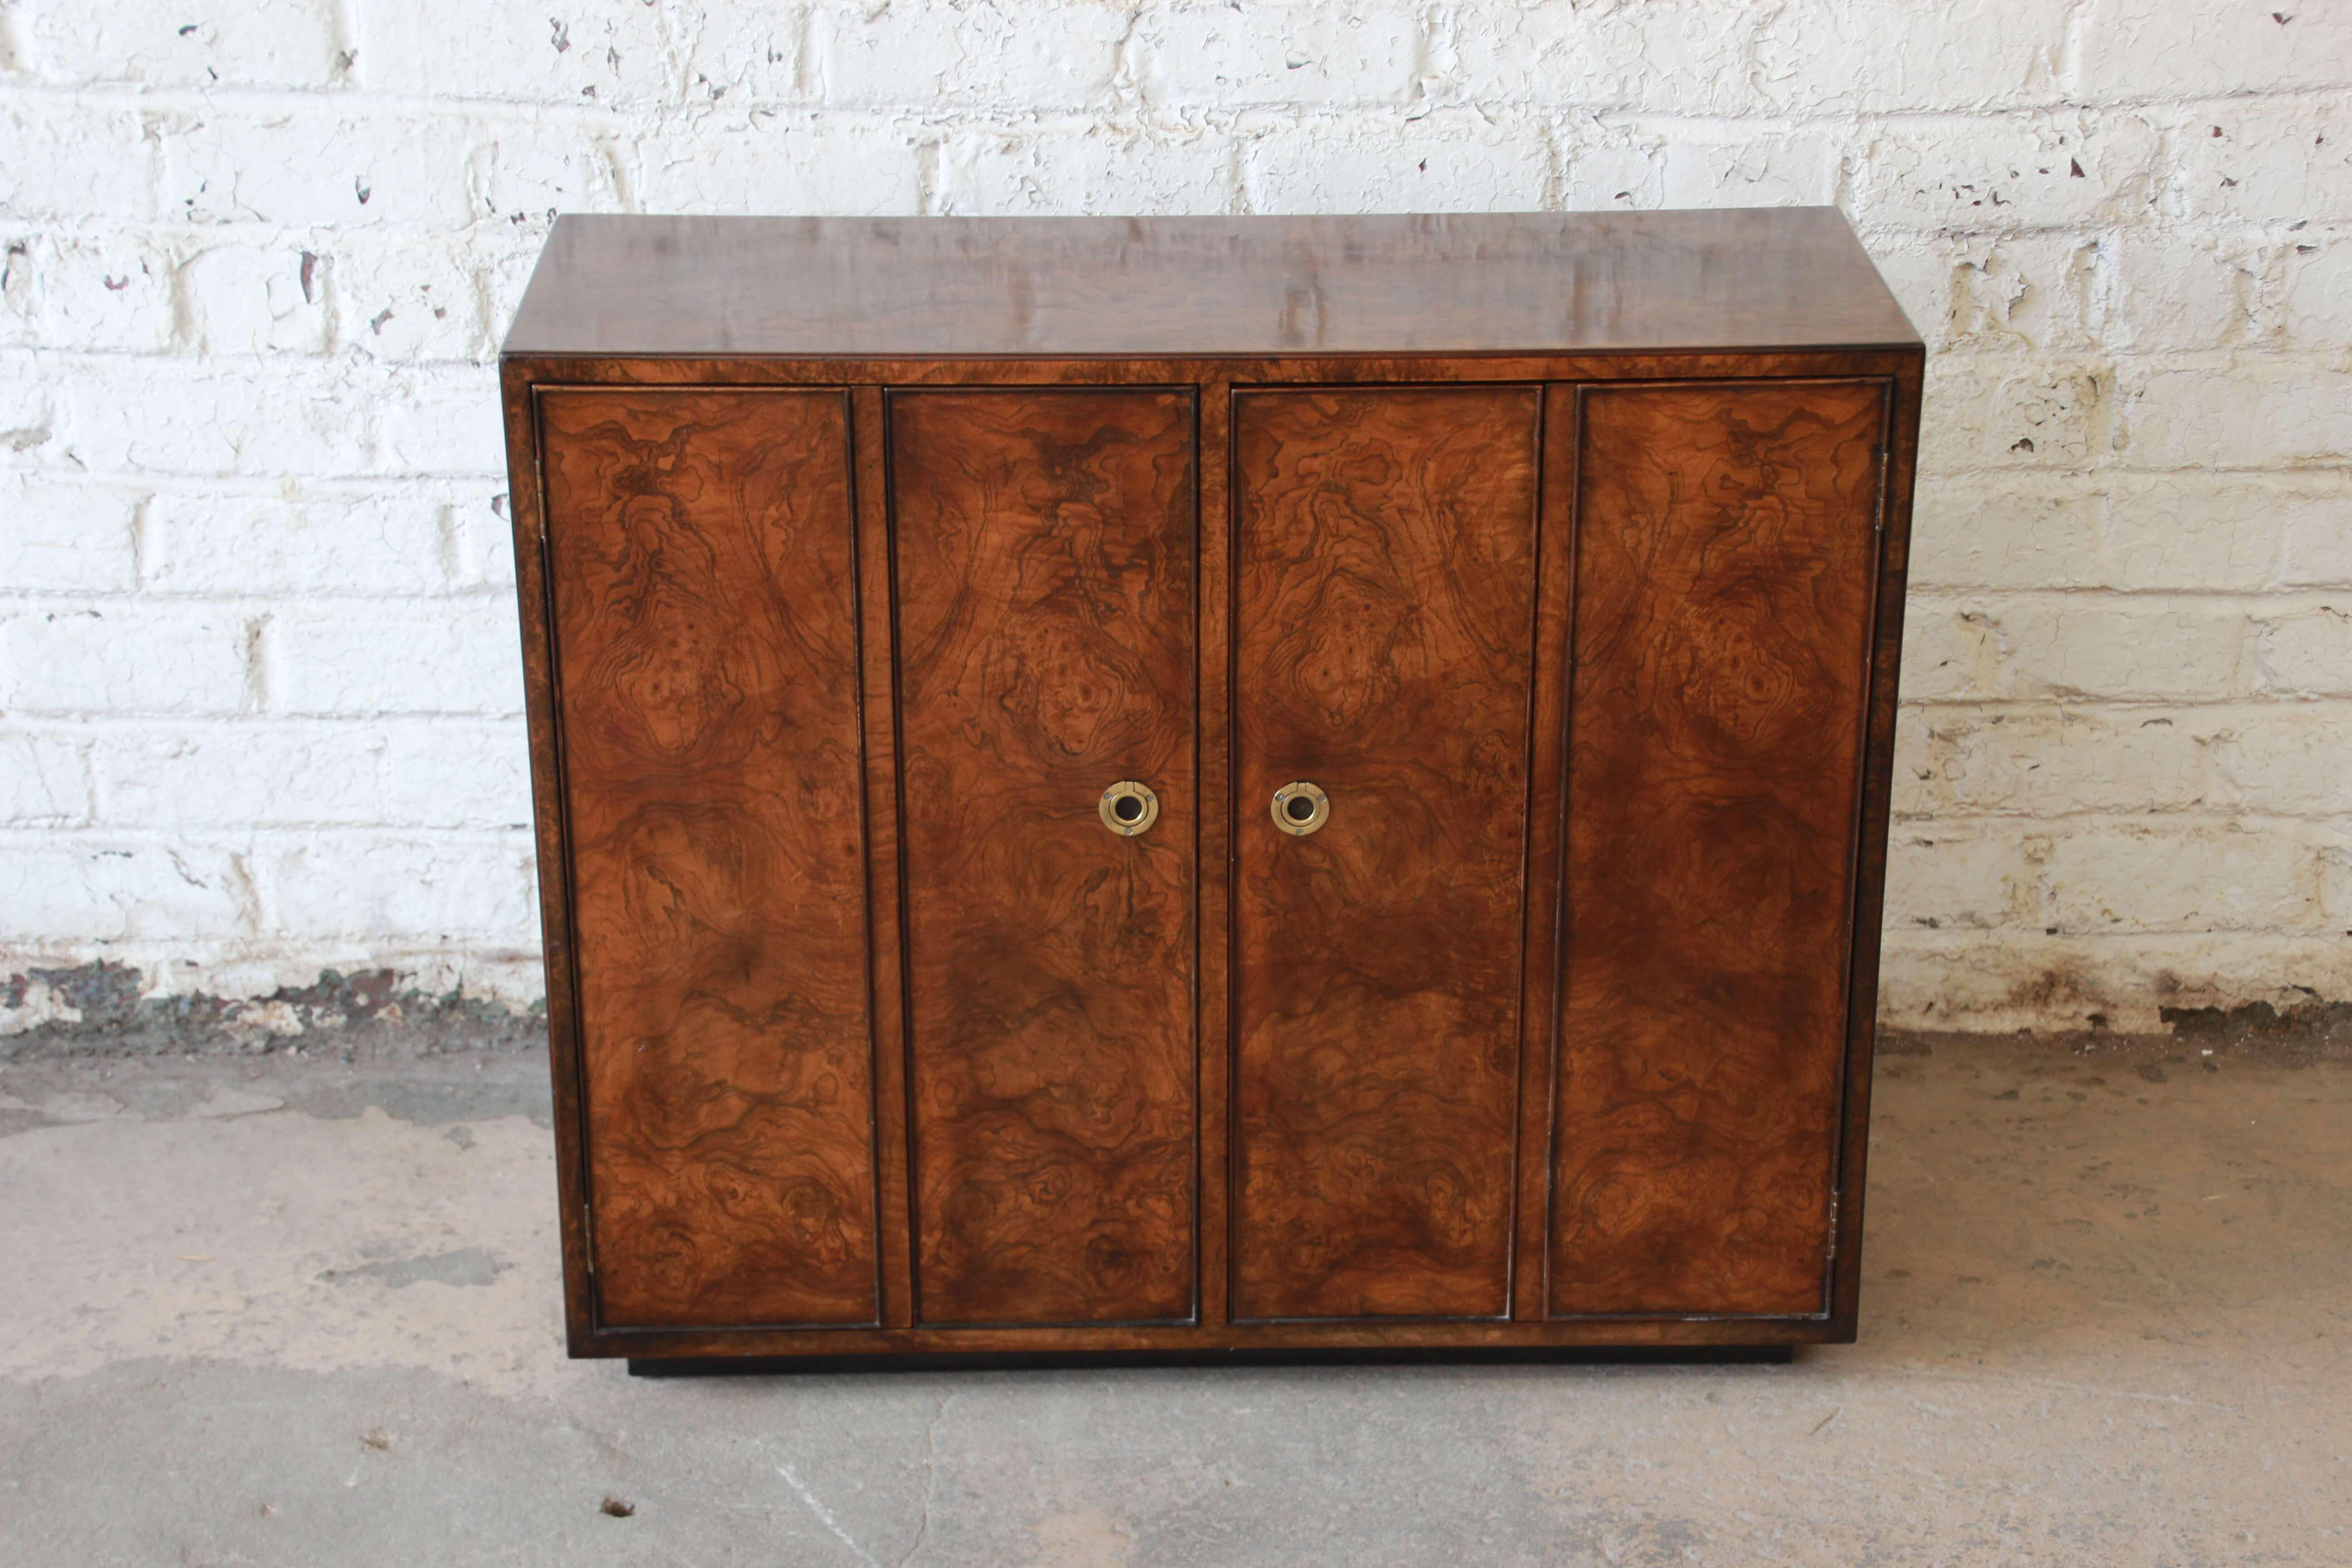 Vintage Burl Wood Bar Cabinet By John Widdicomb   Image 3 Of 9